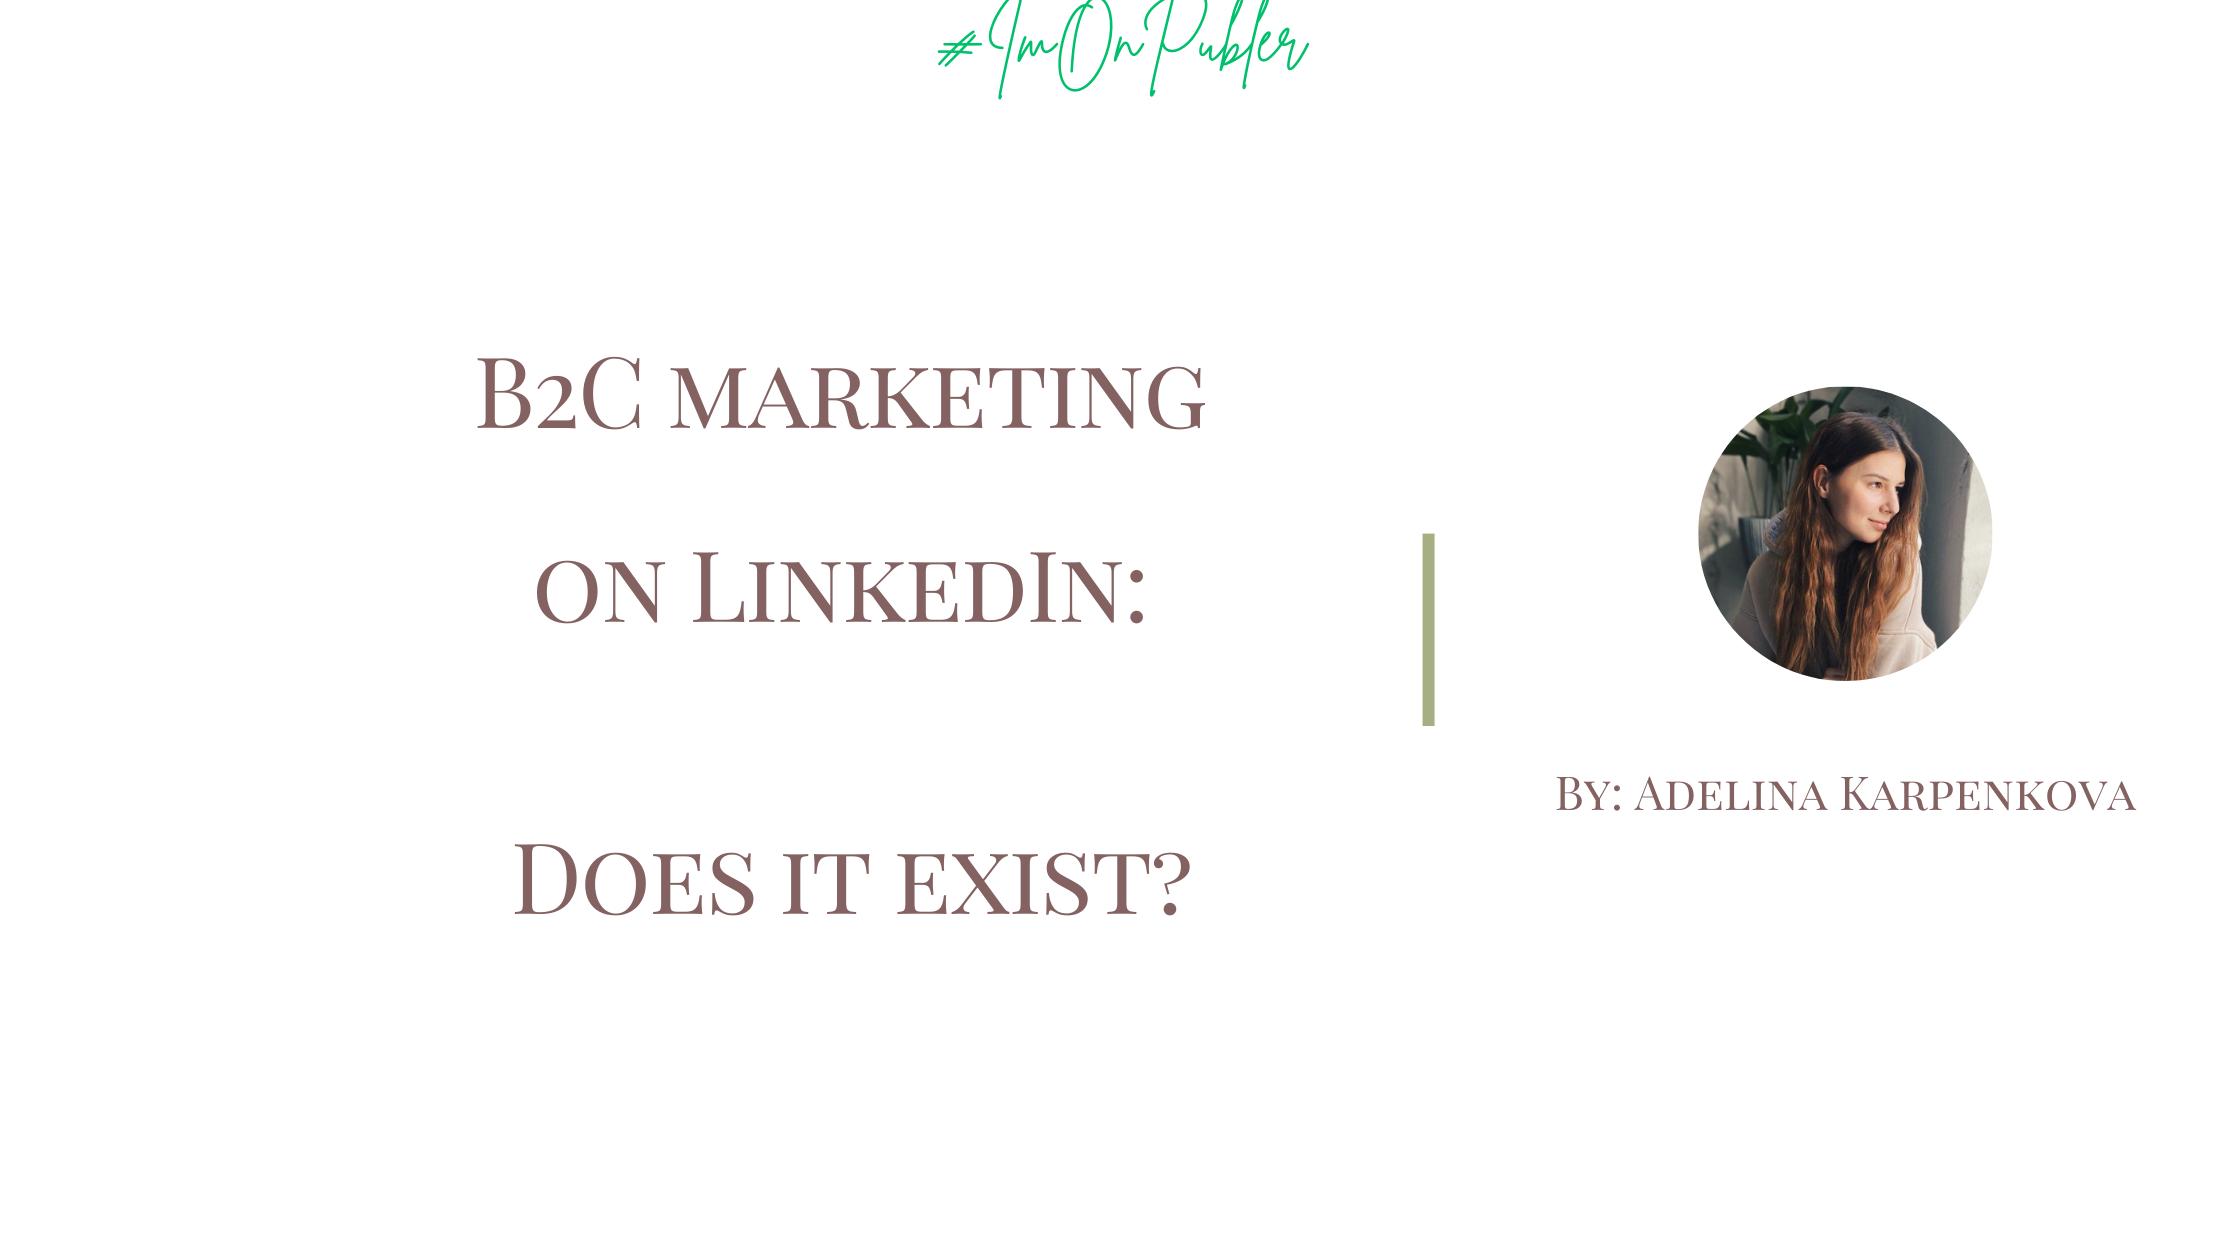 B2C marketing on LinkedIn: Does it exist? by Adelina Karpenkova